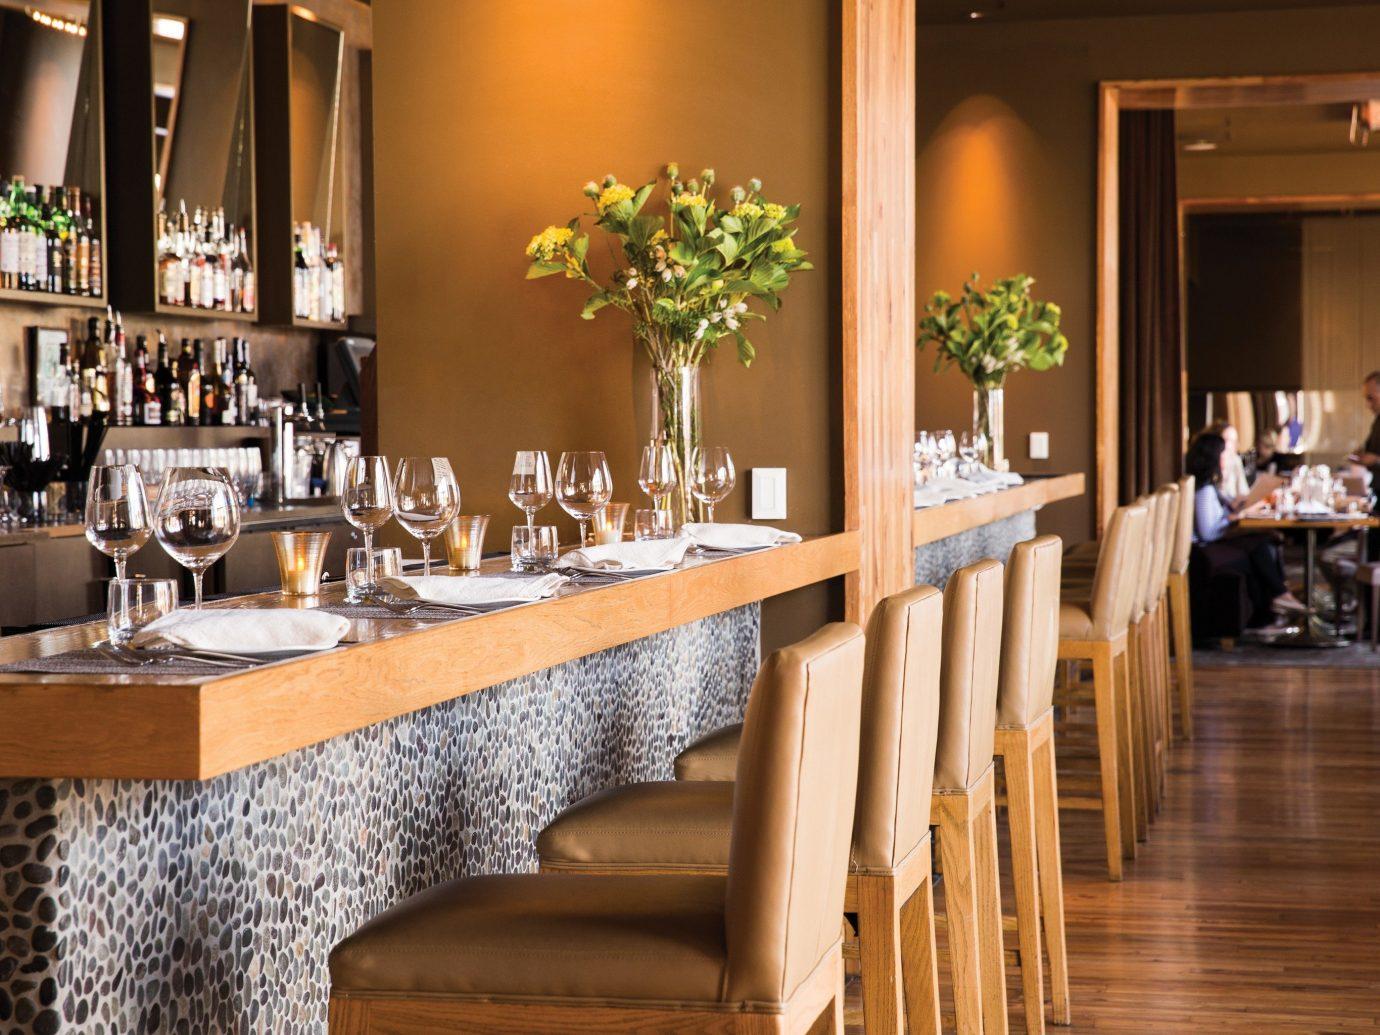 Food + Drink floor indoor dining room room restaurant meal interior design estate Bar wood furniture decorated